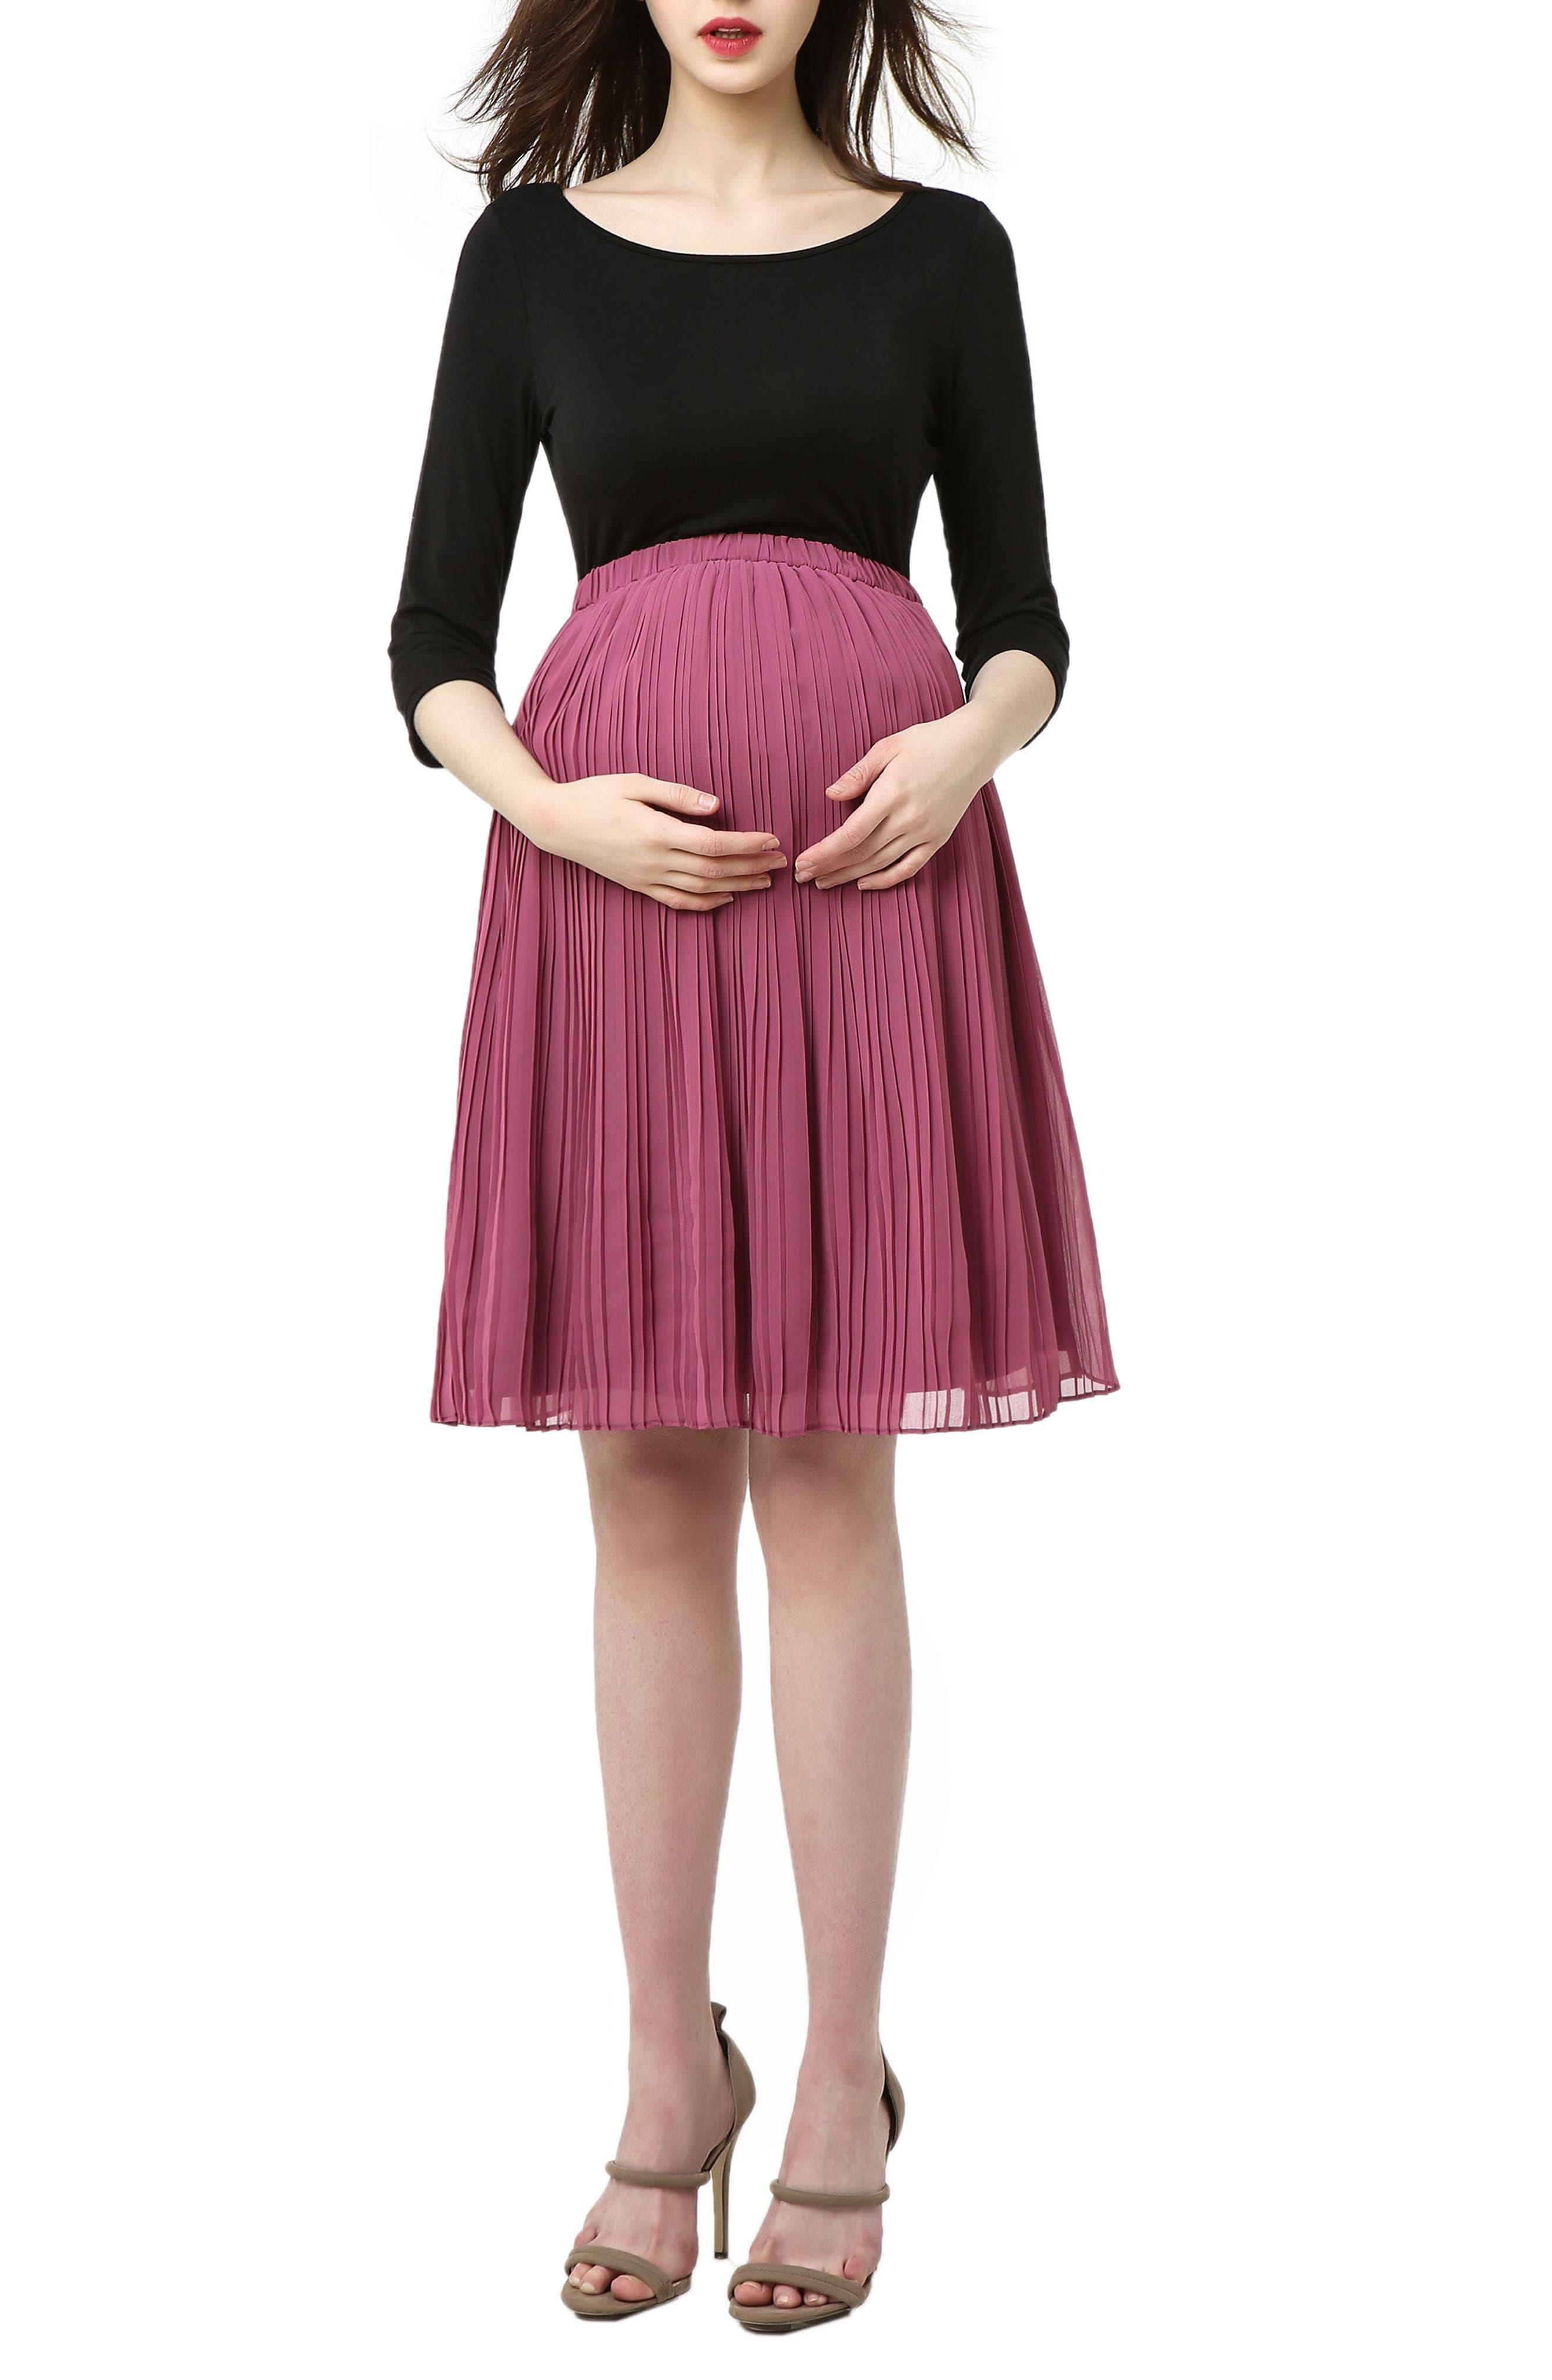 Marie Colorblock Pleat Skirt Maternity Dress,                         Main,                         color, Black